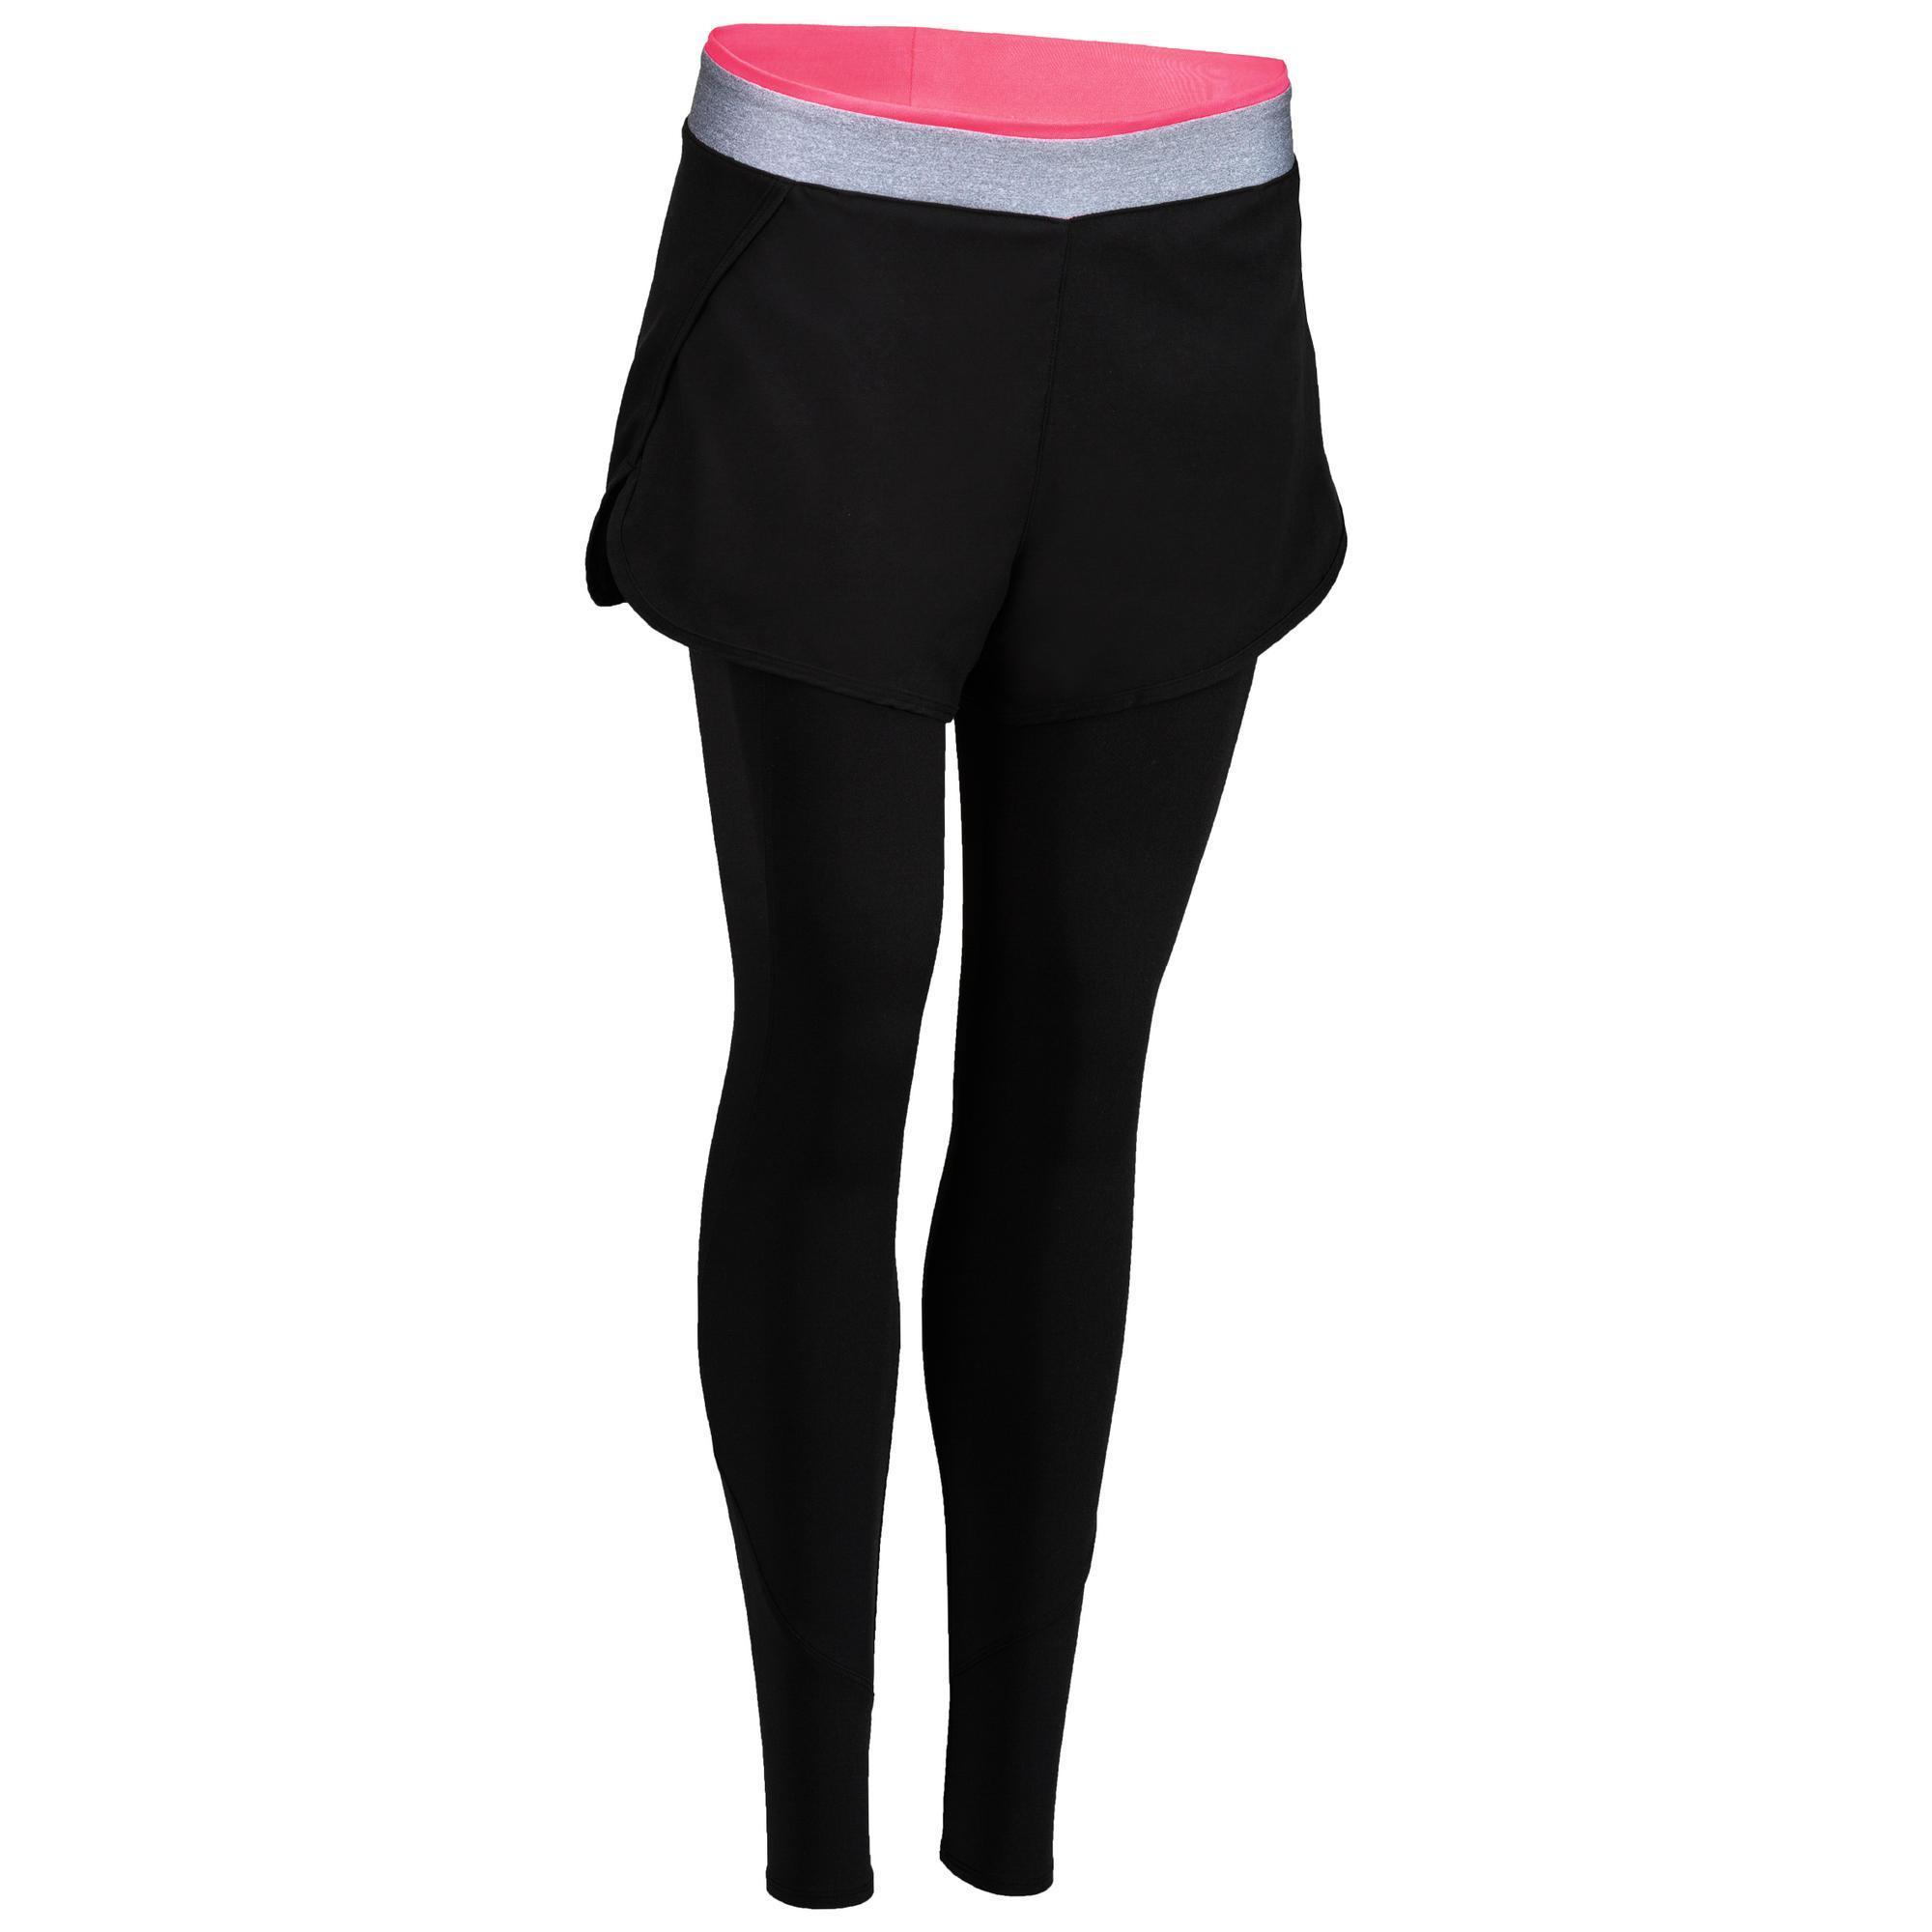 100 Women S Cardio Fitness Legging Short Black Domyos By Decathlon